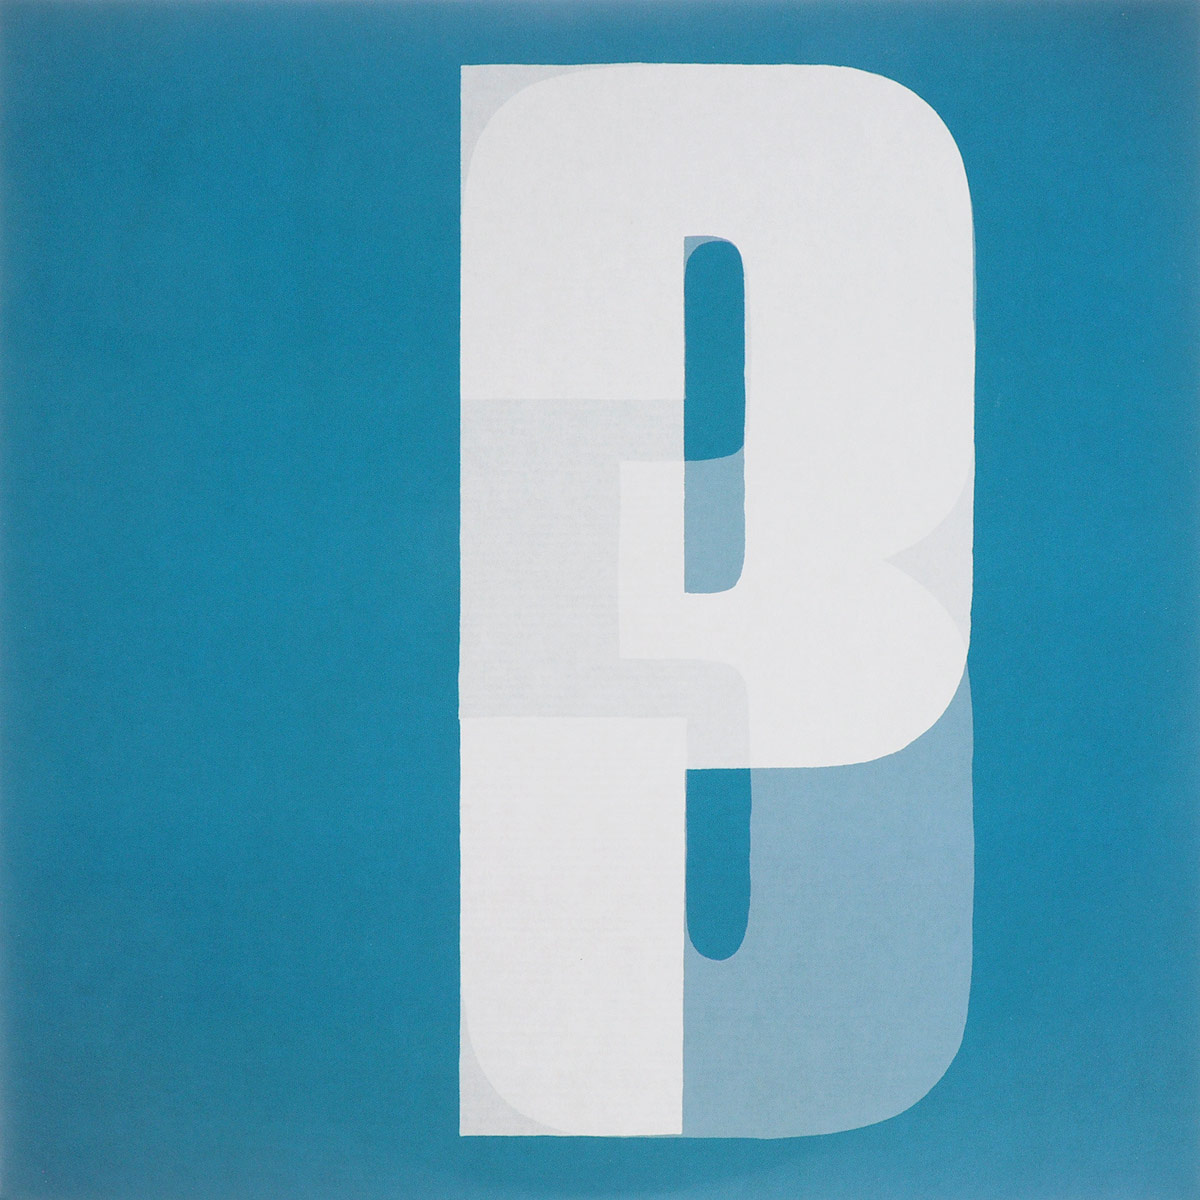 Фото - Portishead Portishead. Third (2 LP) portishead portishead roseland nyc live 2 lp